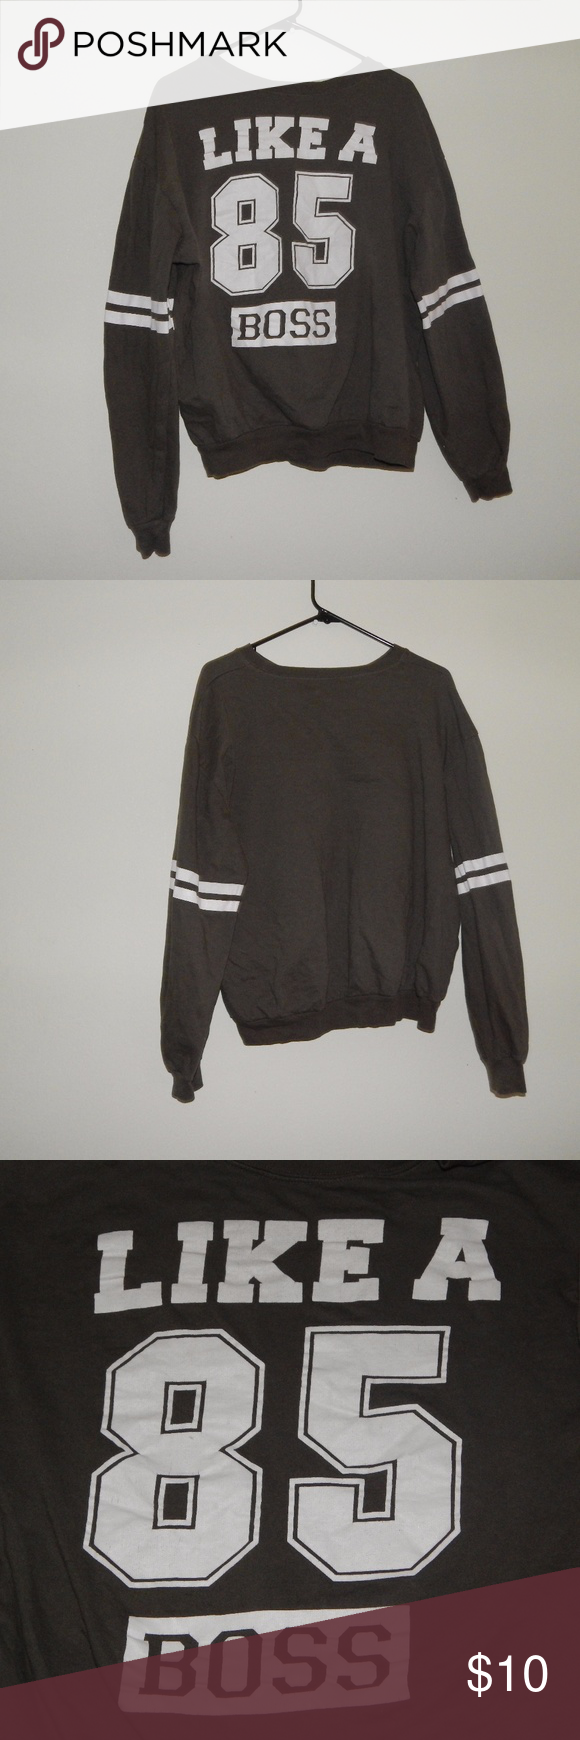 Like A Boss 85 Sweatshirt Olive Green Sweatshirts Clothes Design Sweatshirts Hoodie [ 1740 x 580 Pixel ]